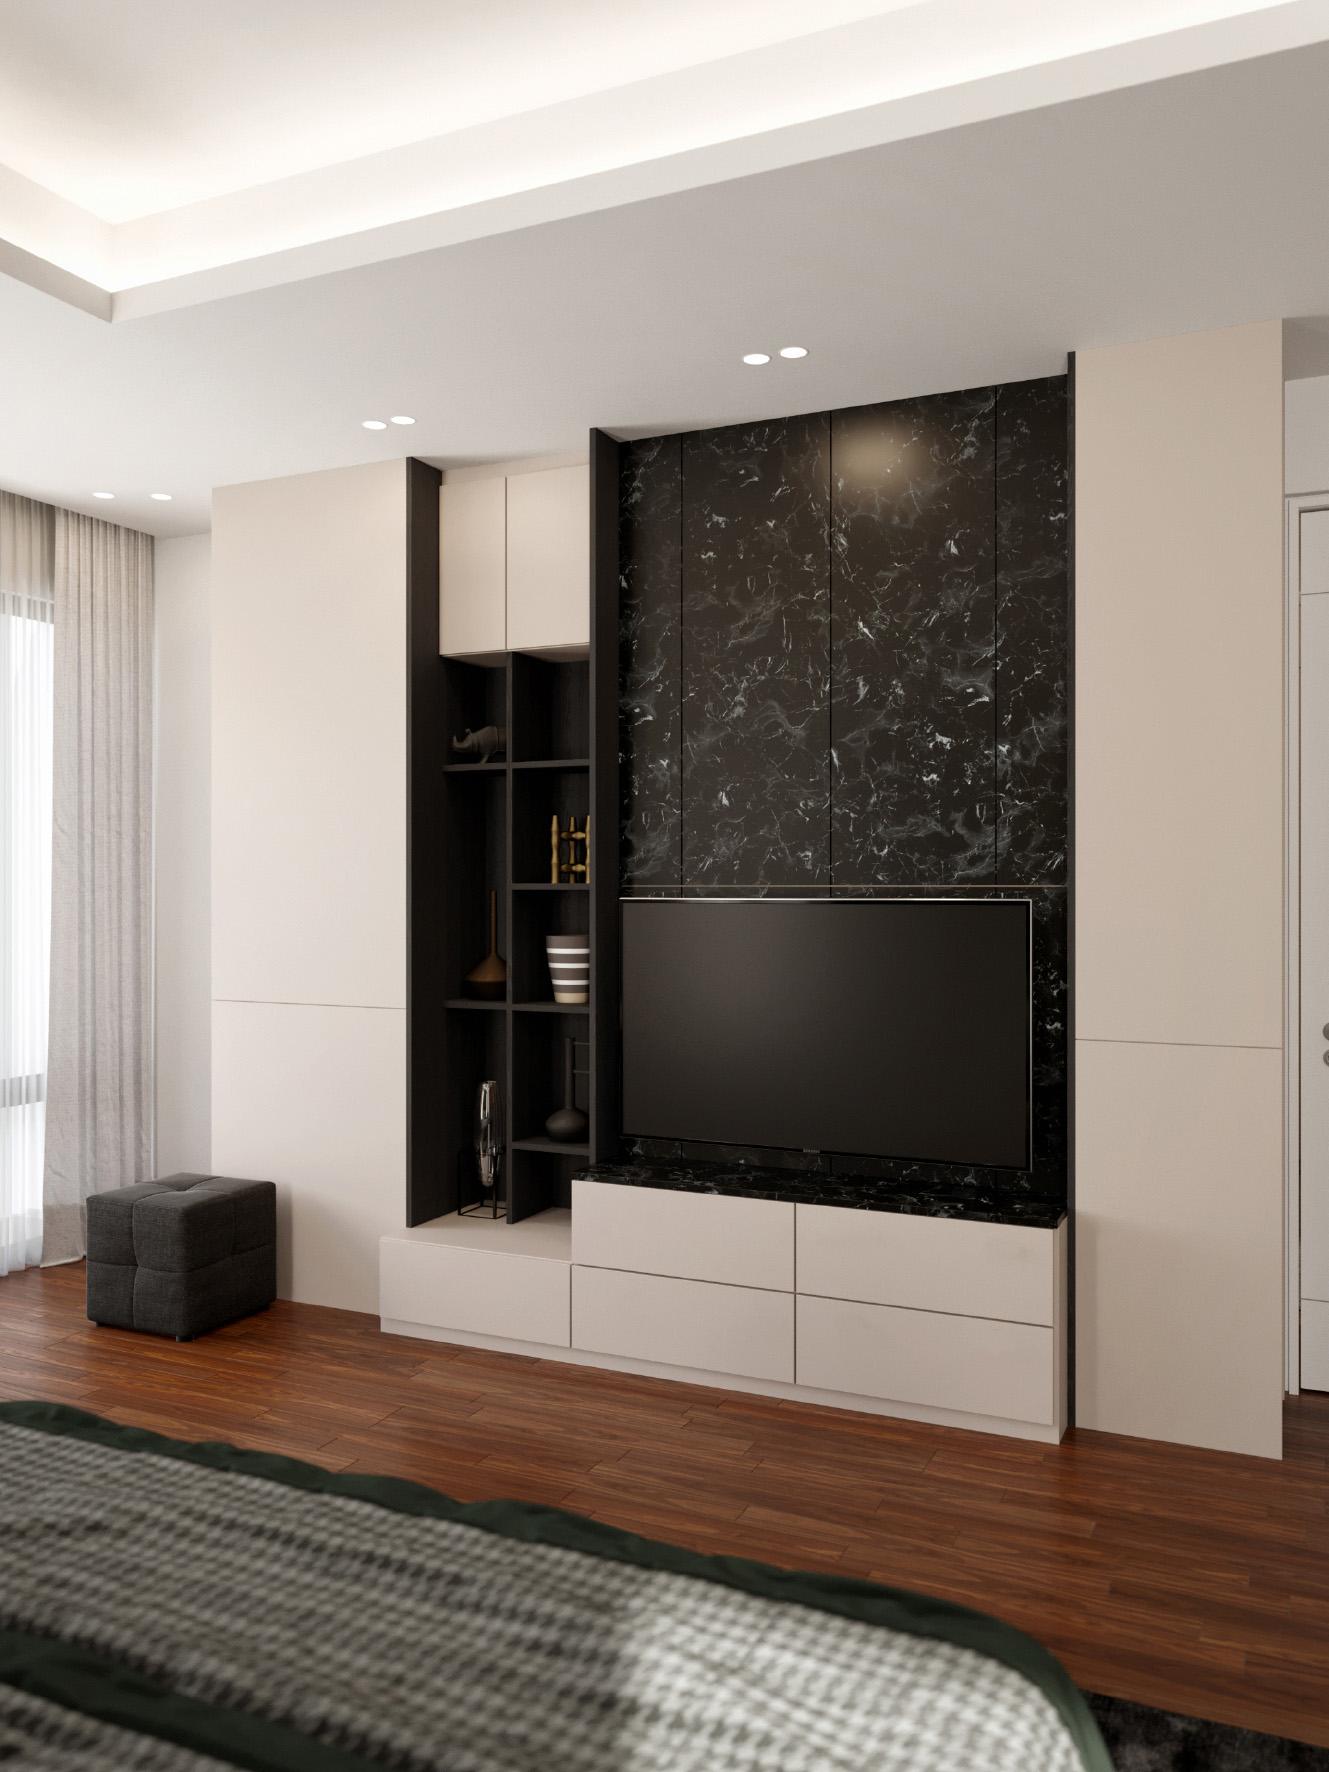 LV302 Bedroom 2